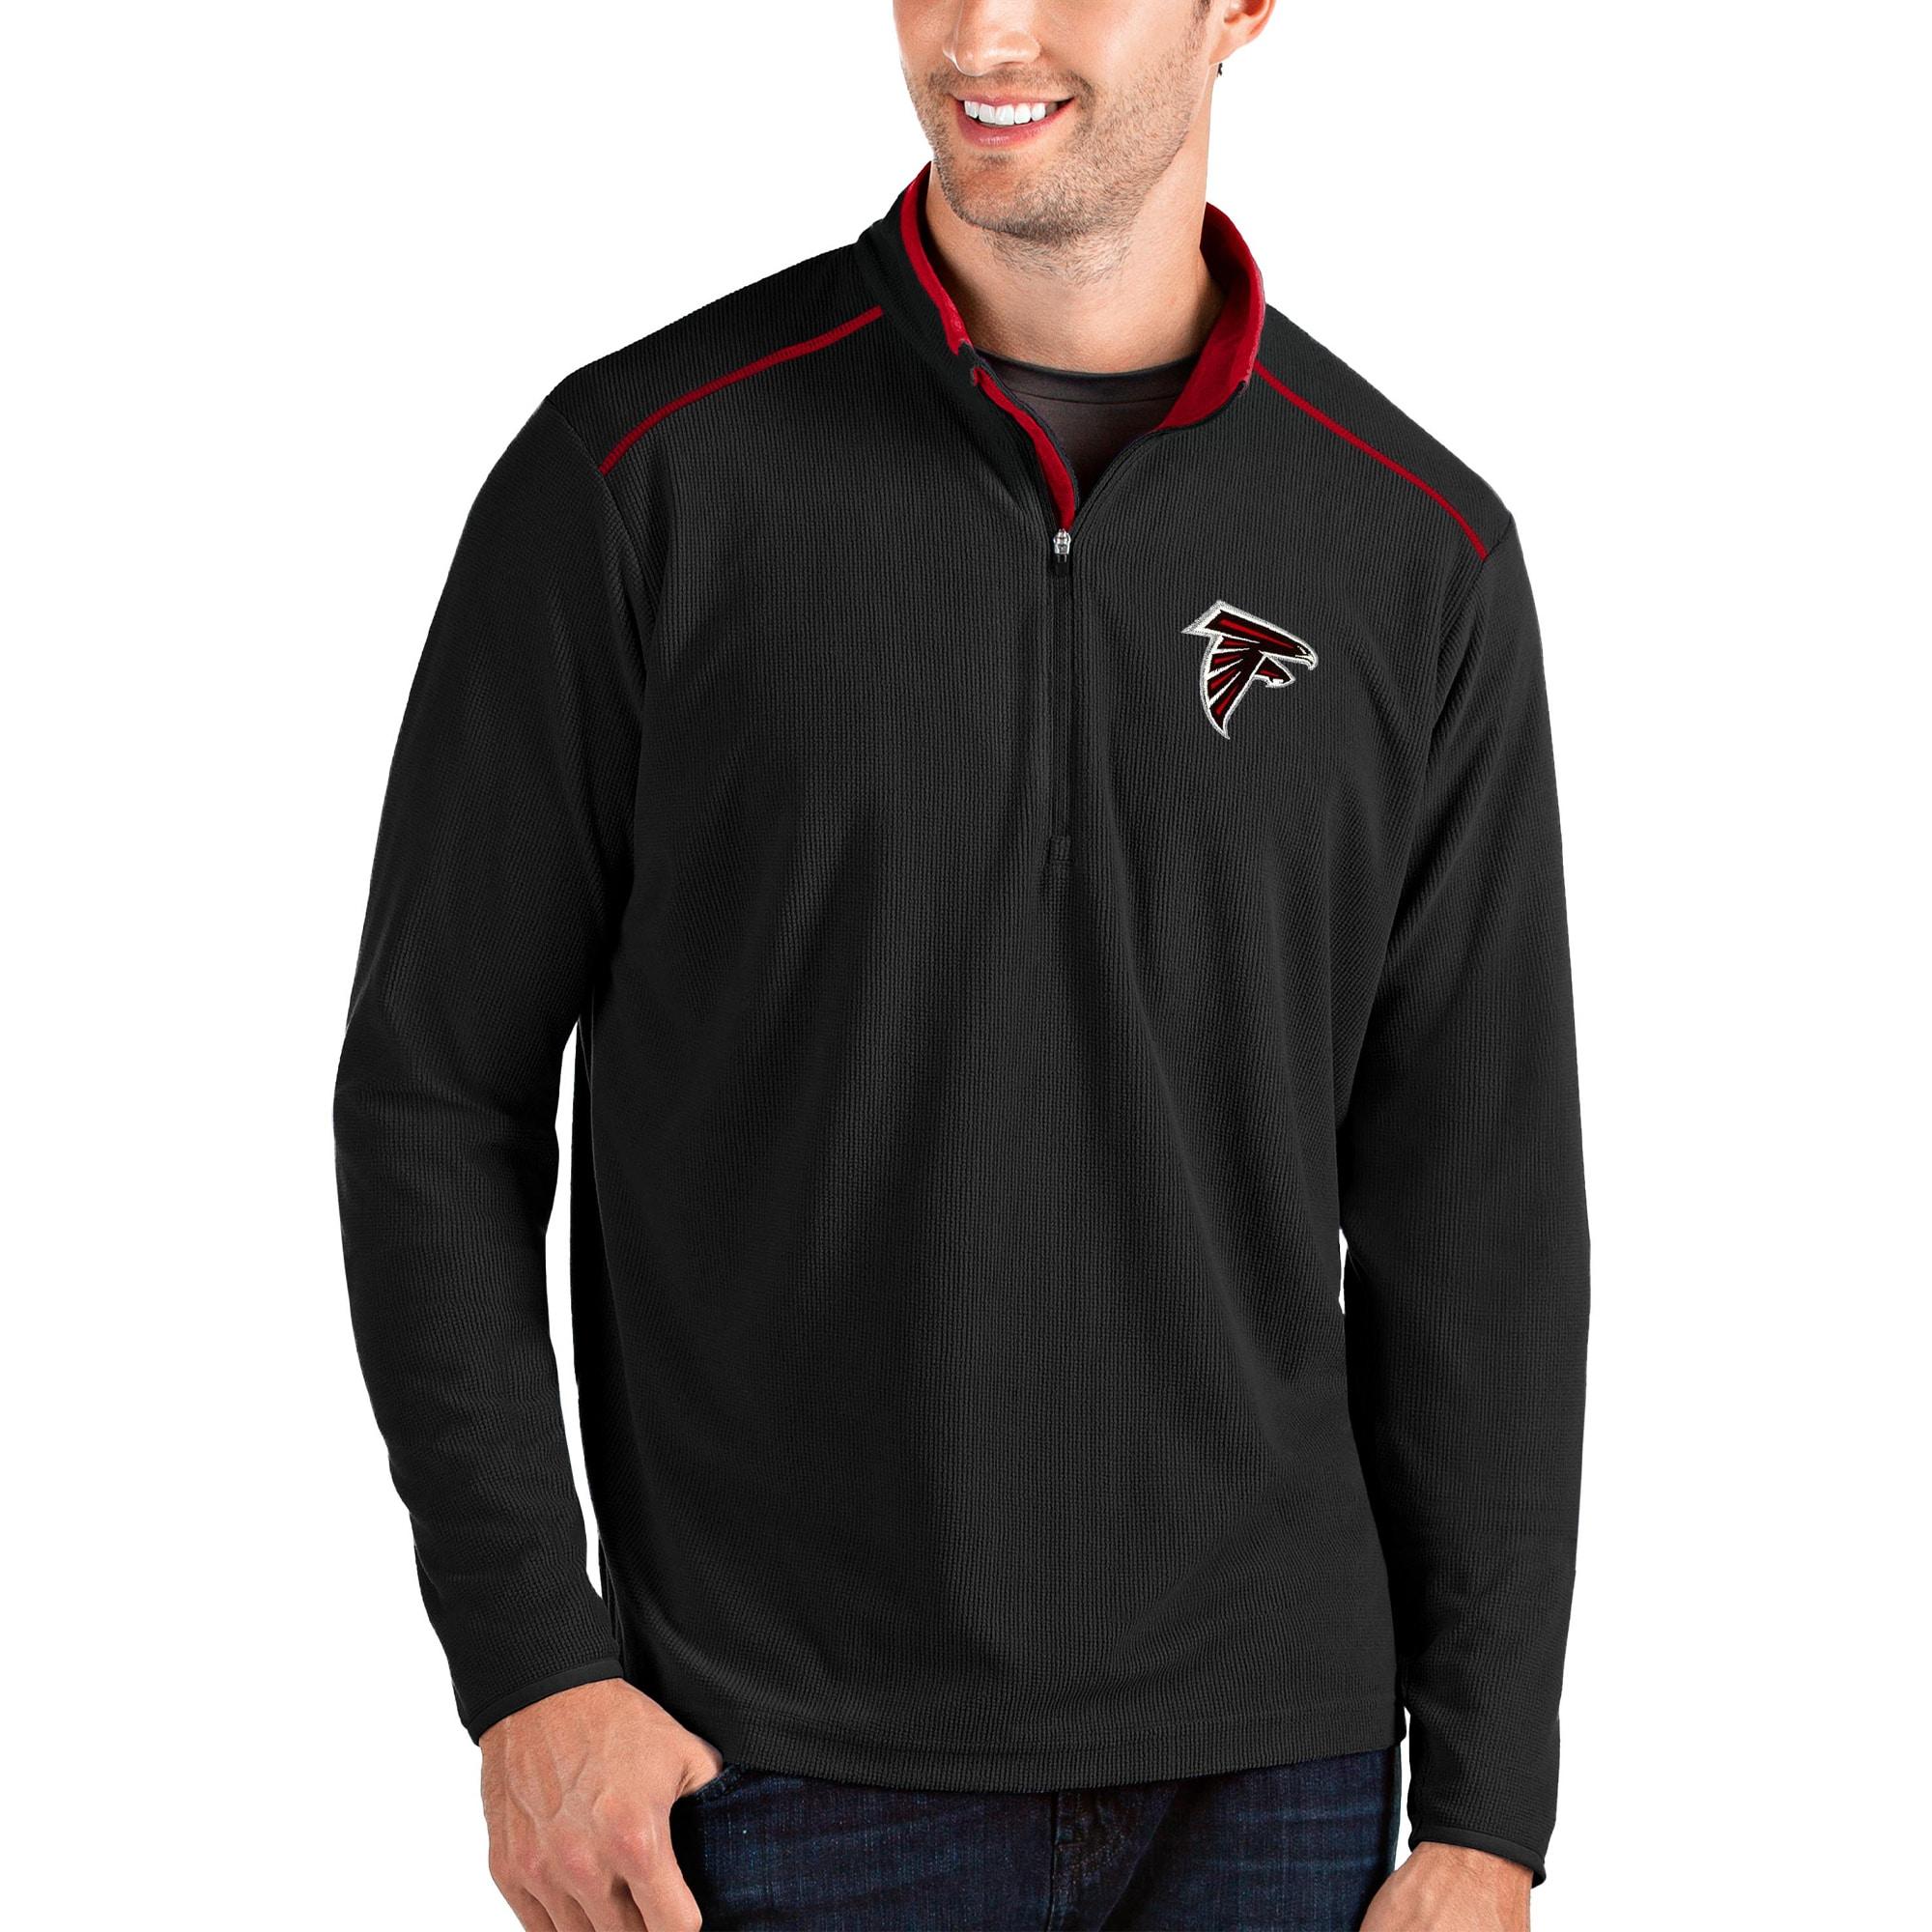 Atlanta Falcons Antigua Glacier Quarter-Zip Pullover Jacket - Black/Red